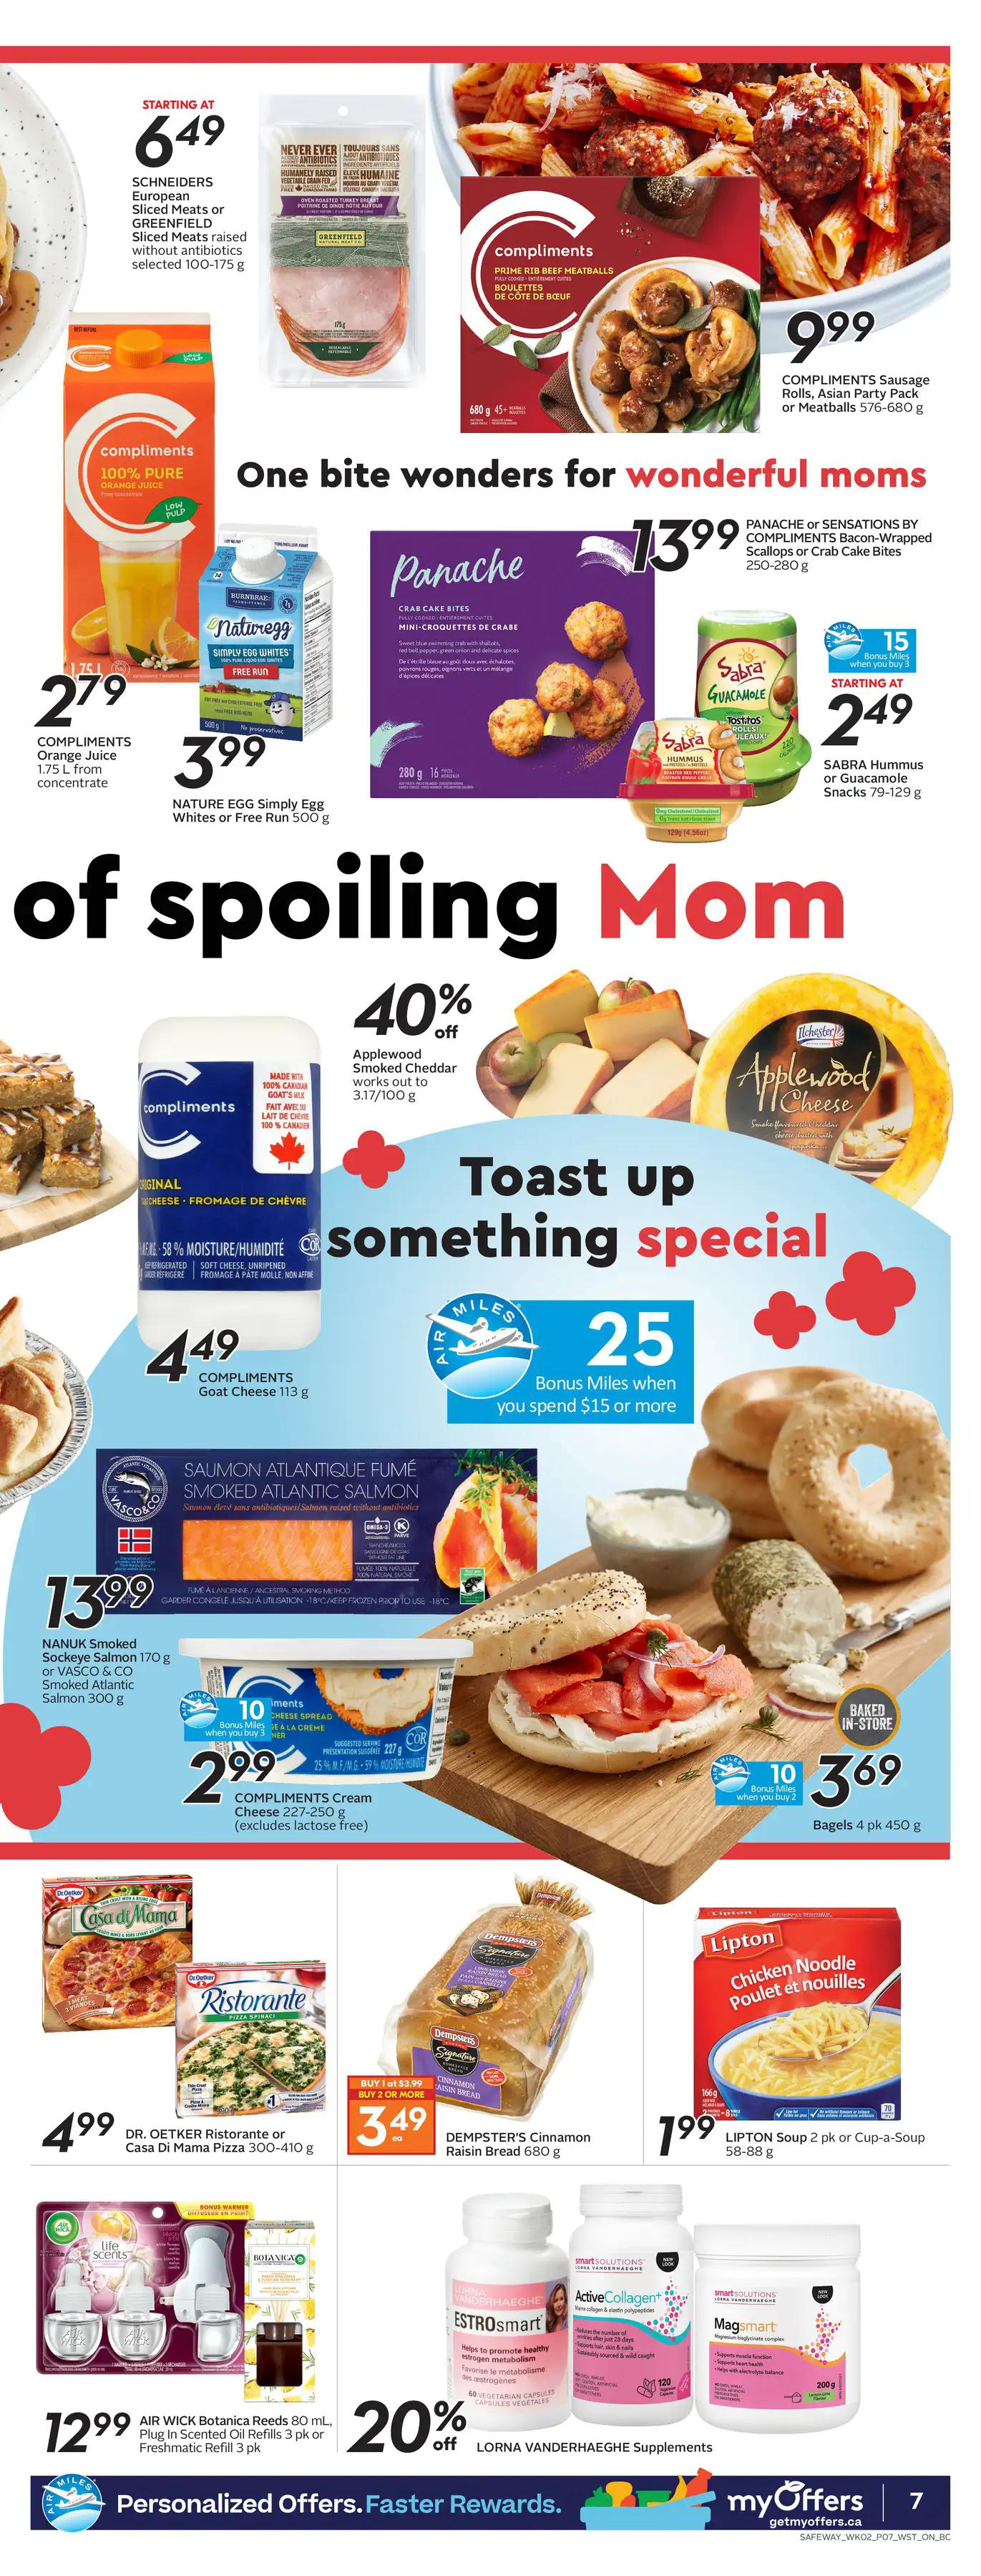 Safeway - Weekly Flyer Specials - Page 8